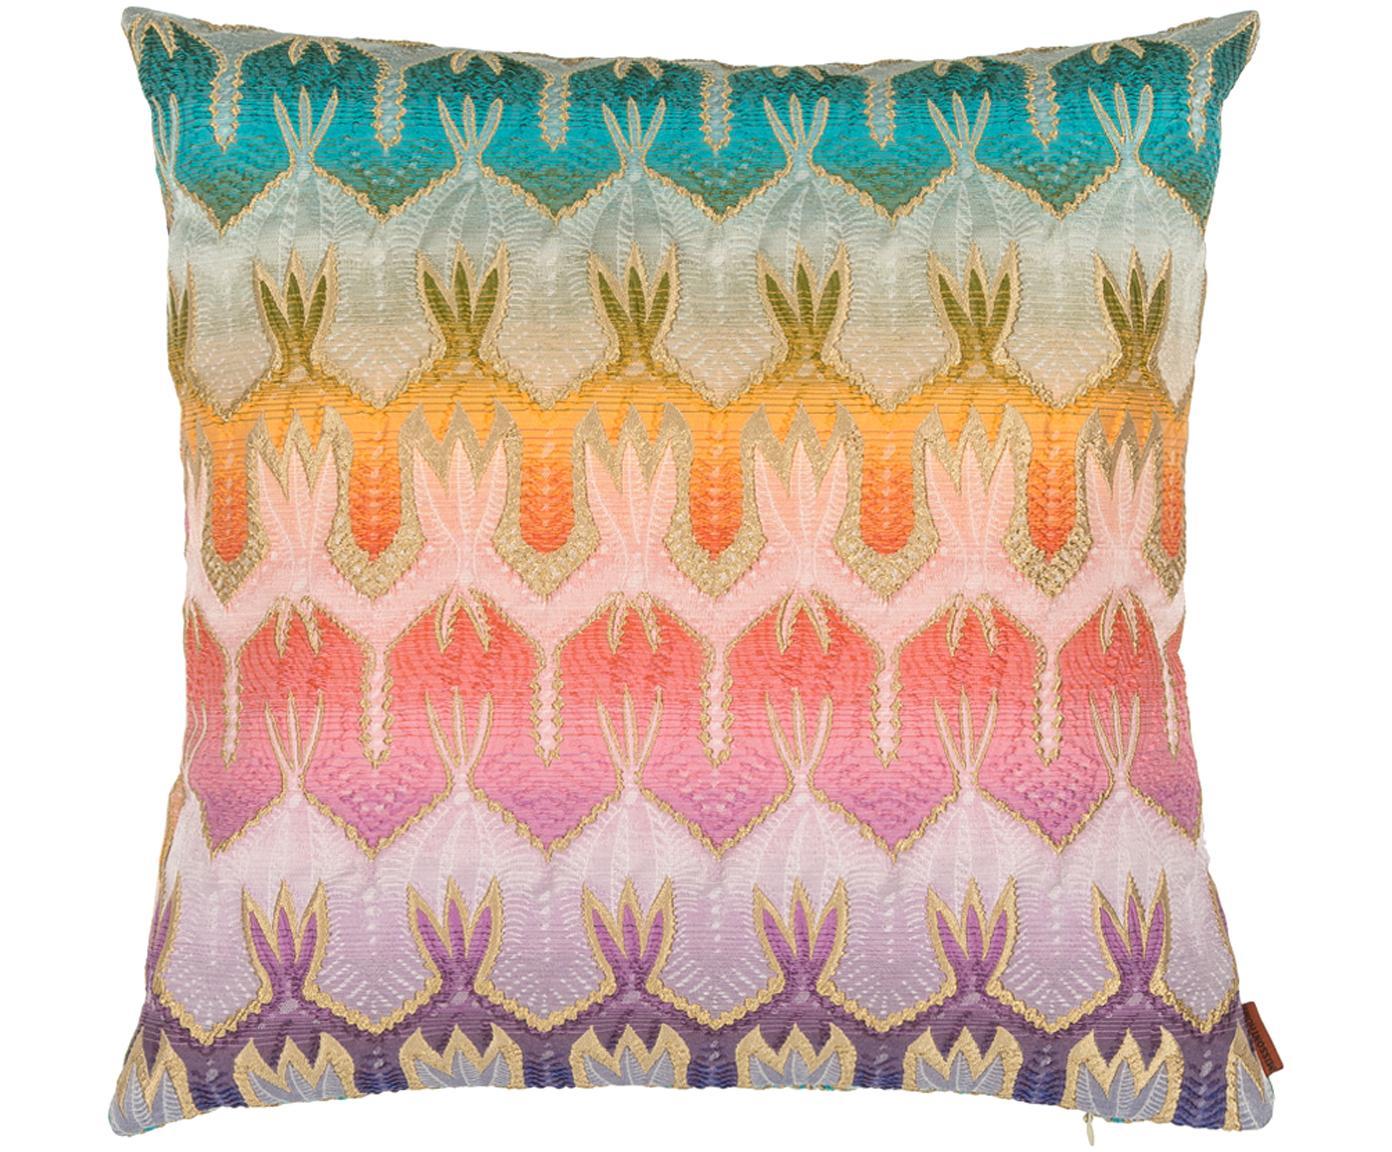 Cuscino di design con imbottitura Pasadena, Rivestimento: 53% poliestere, 38% coton, Multicolore, Larg. 40 x Lung. 40 cm